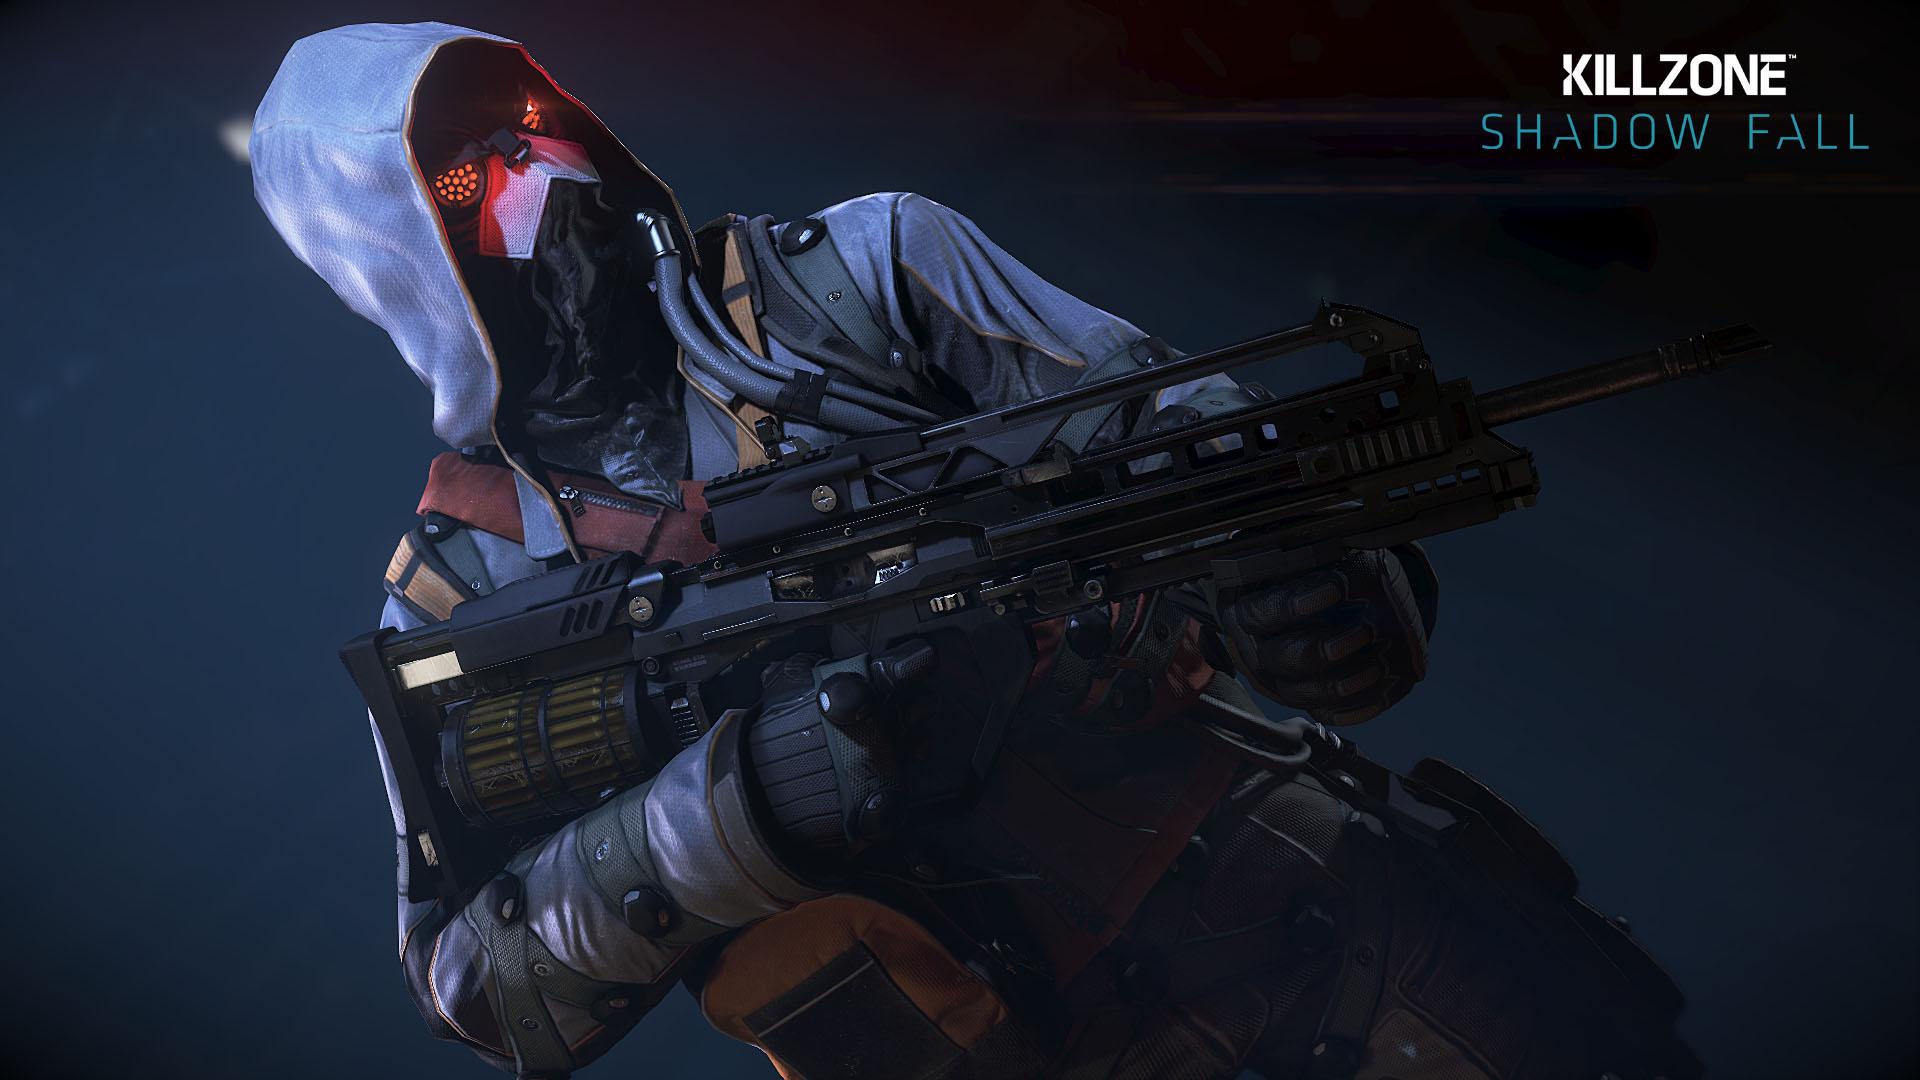 The Black Hand – Guerilla enthüllt den Antagonist in Killzone: Shadow Fall